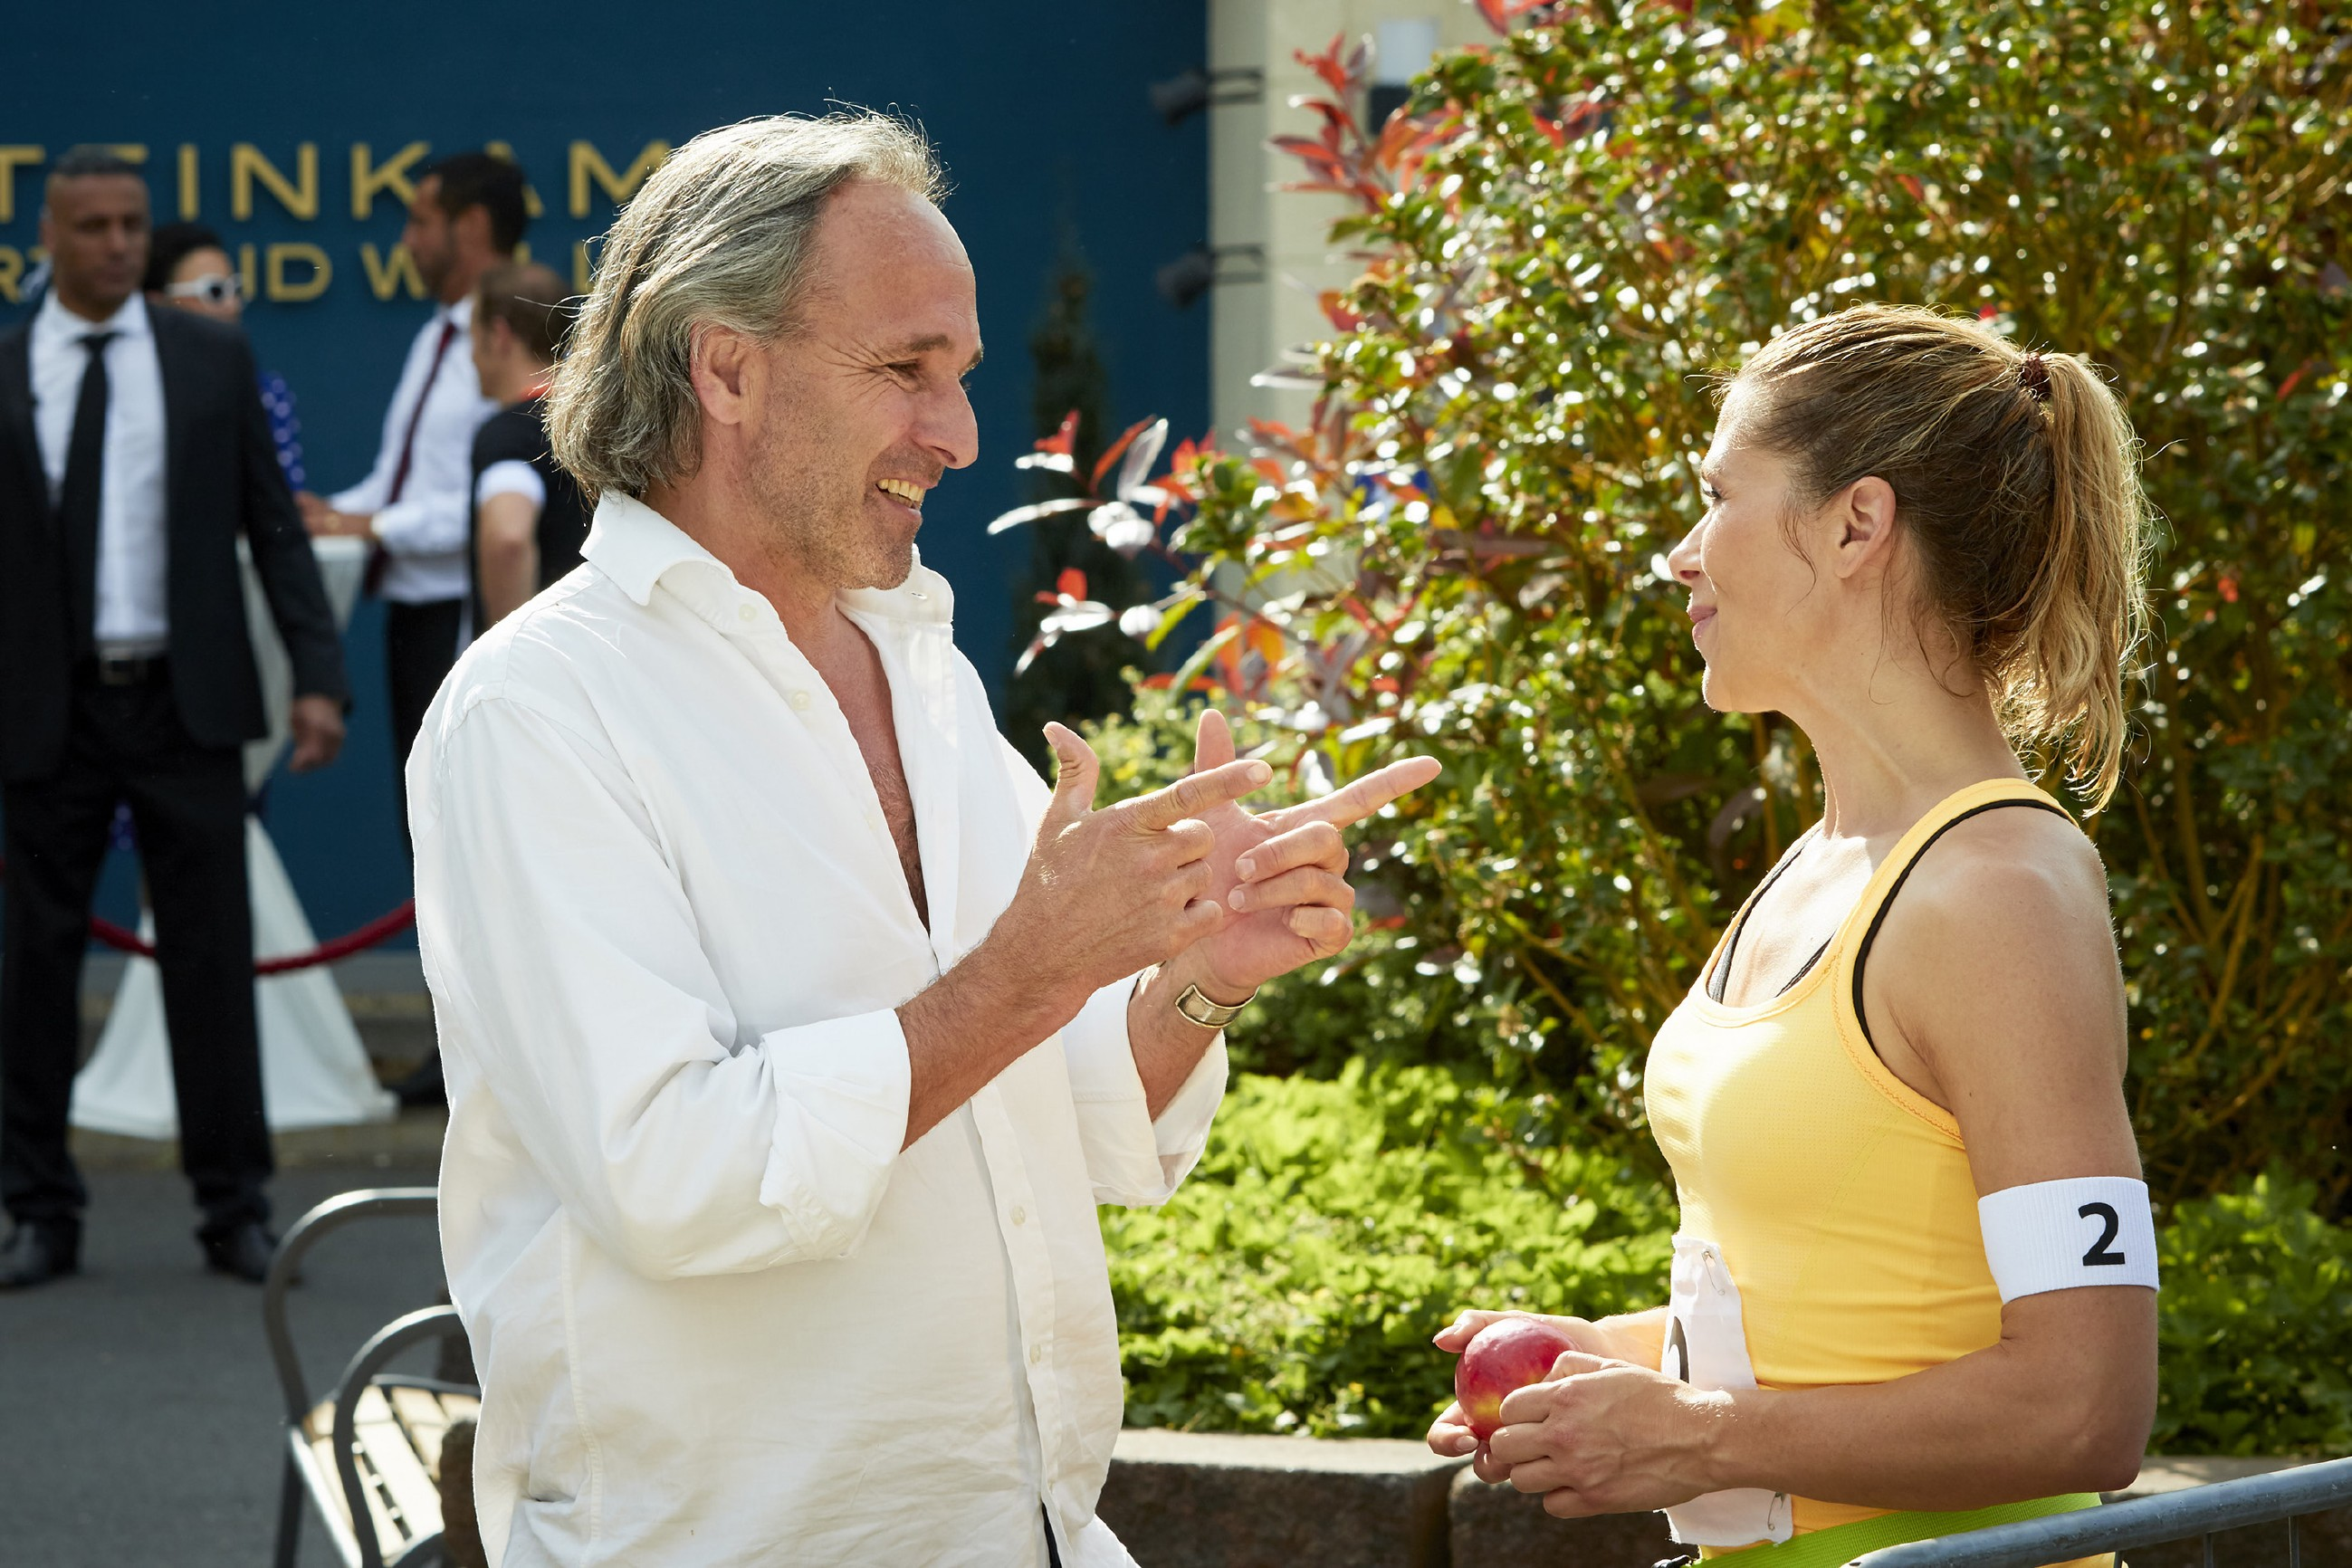 Johann (Holger Christian Gotha) ist begeistert, dass Diana (Tanja Szewczenko) den prominenten Mit-Sportler beim _Battle oft he Best_ schlagen konnte. (Quelle: RTL / Guido Engels)